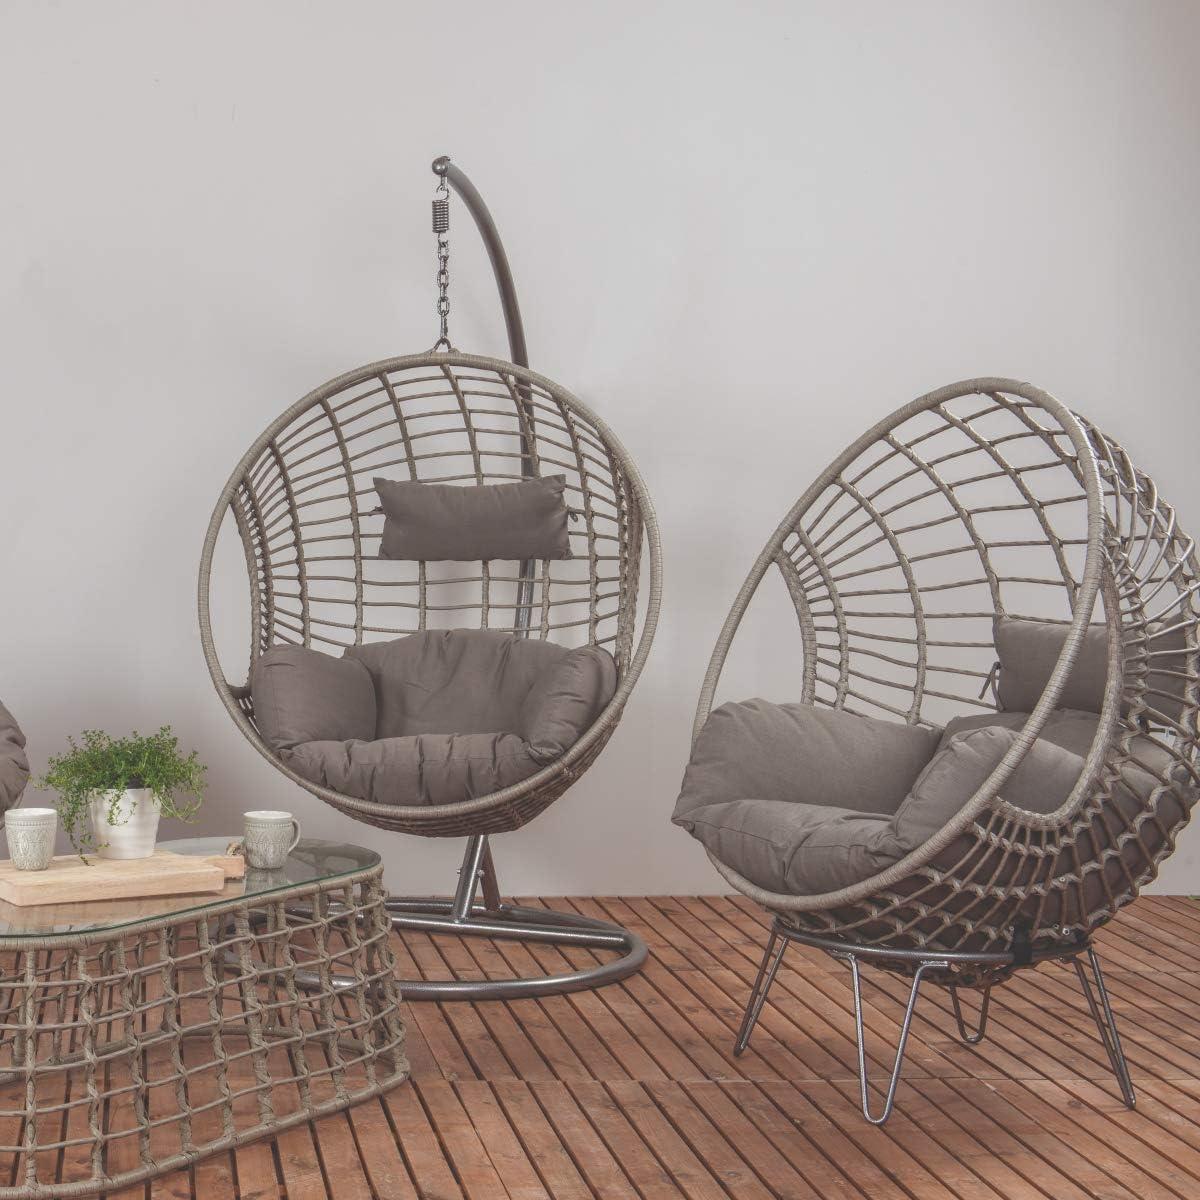 Dawsons Living Milan Hanging Egg Chair Outdoor And Indoor Rattan Weave Swing Hammock Hanging Stand And Floor Stand Grey Amazon Co Uk Garden Outdoors